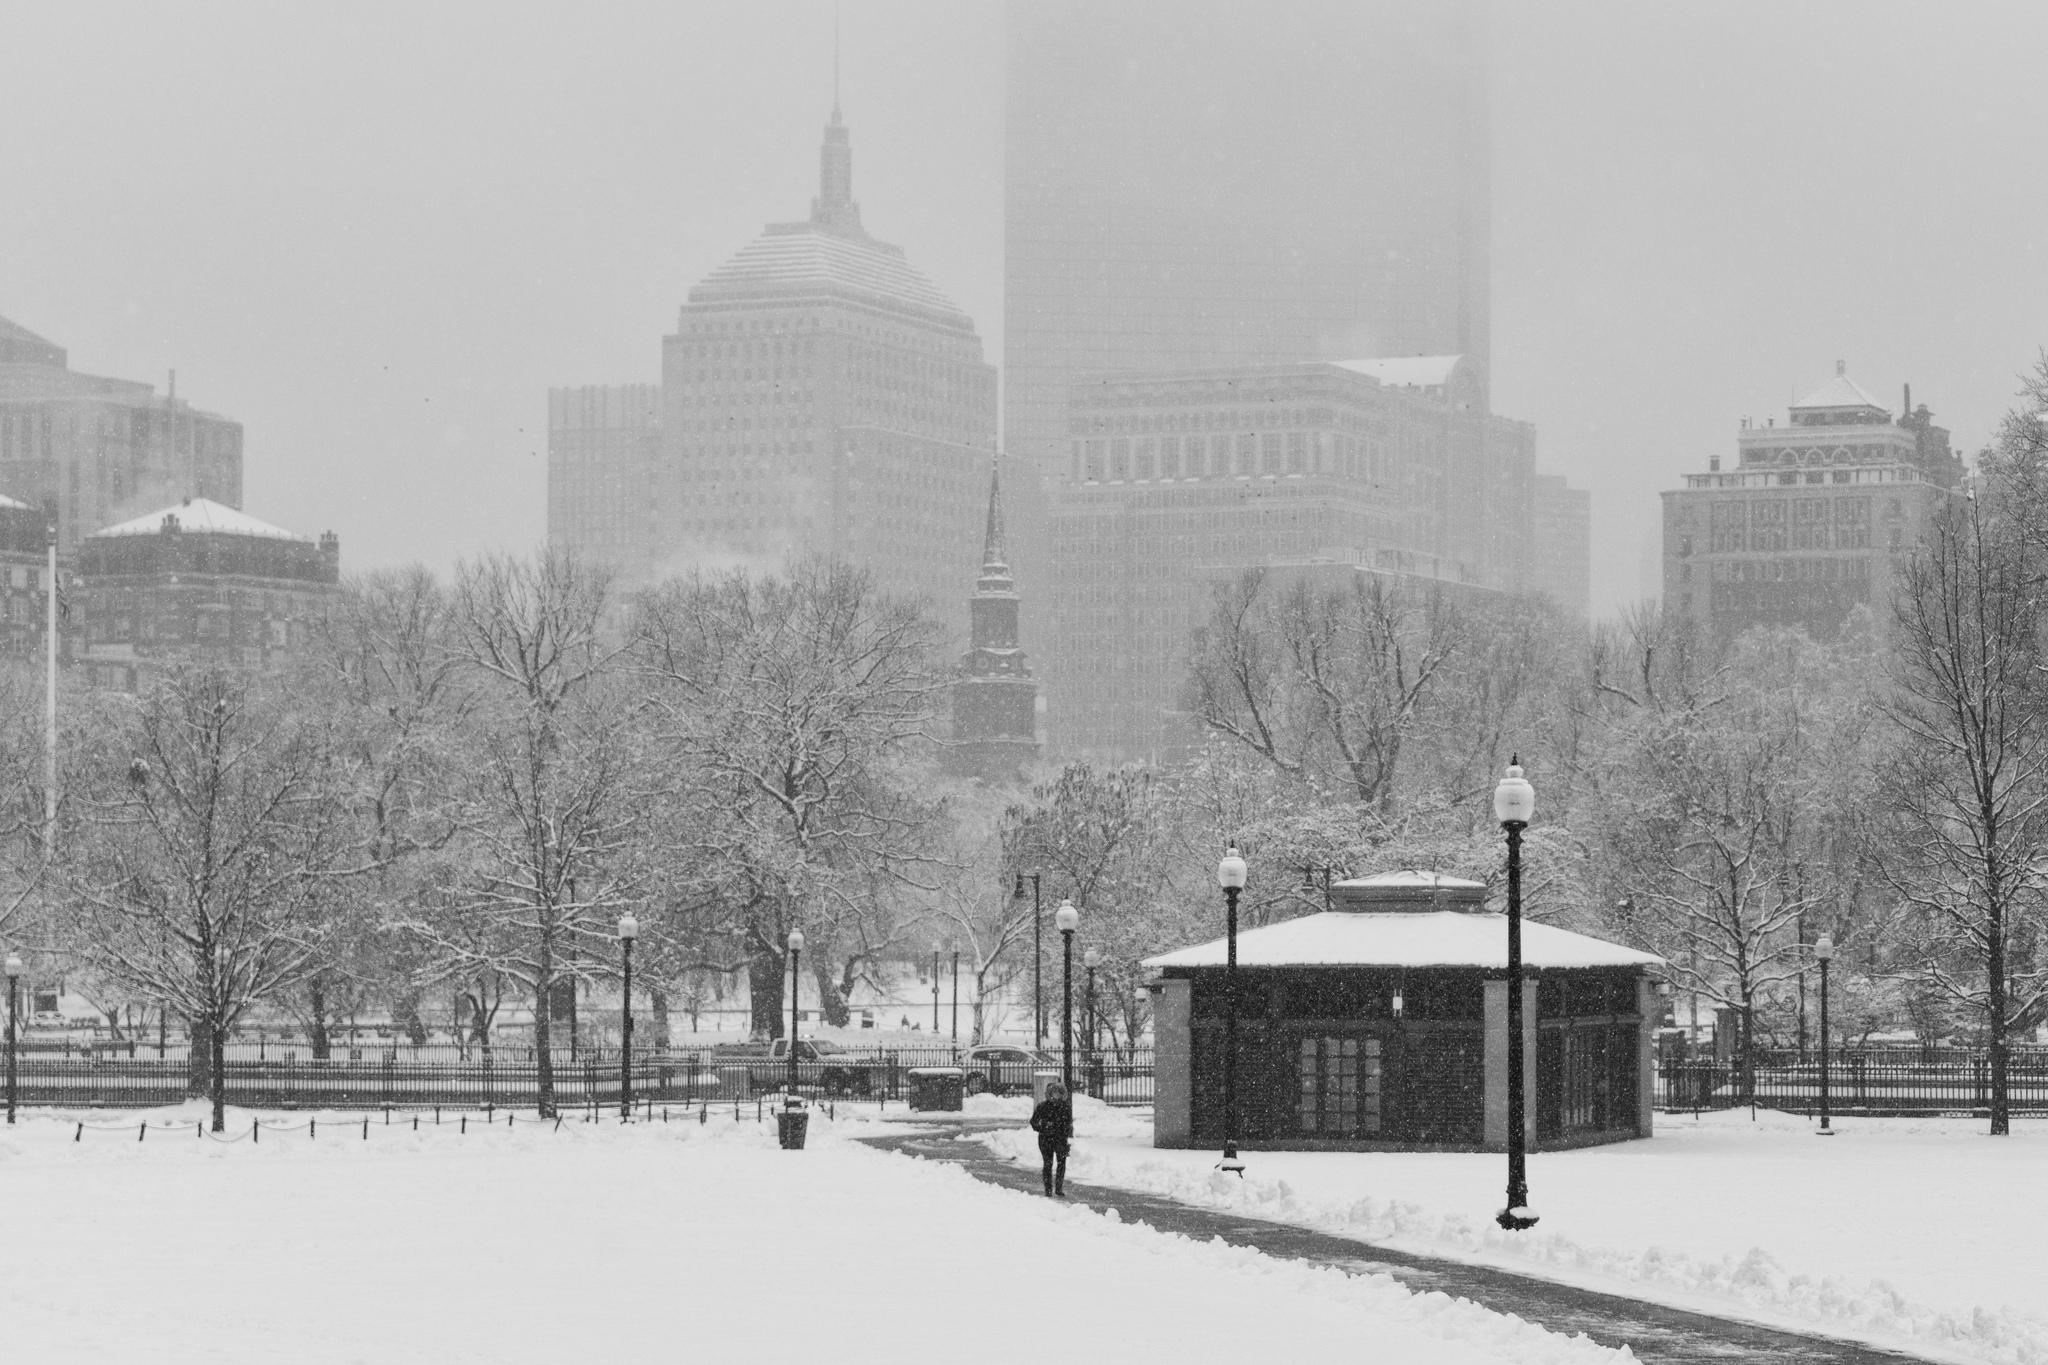 farmers almanac predicts snowy winter 2017